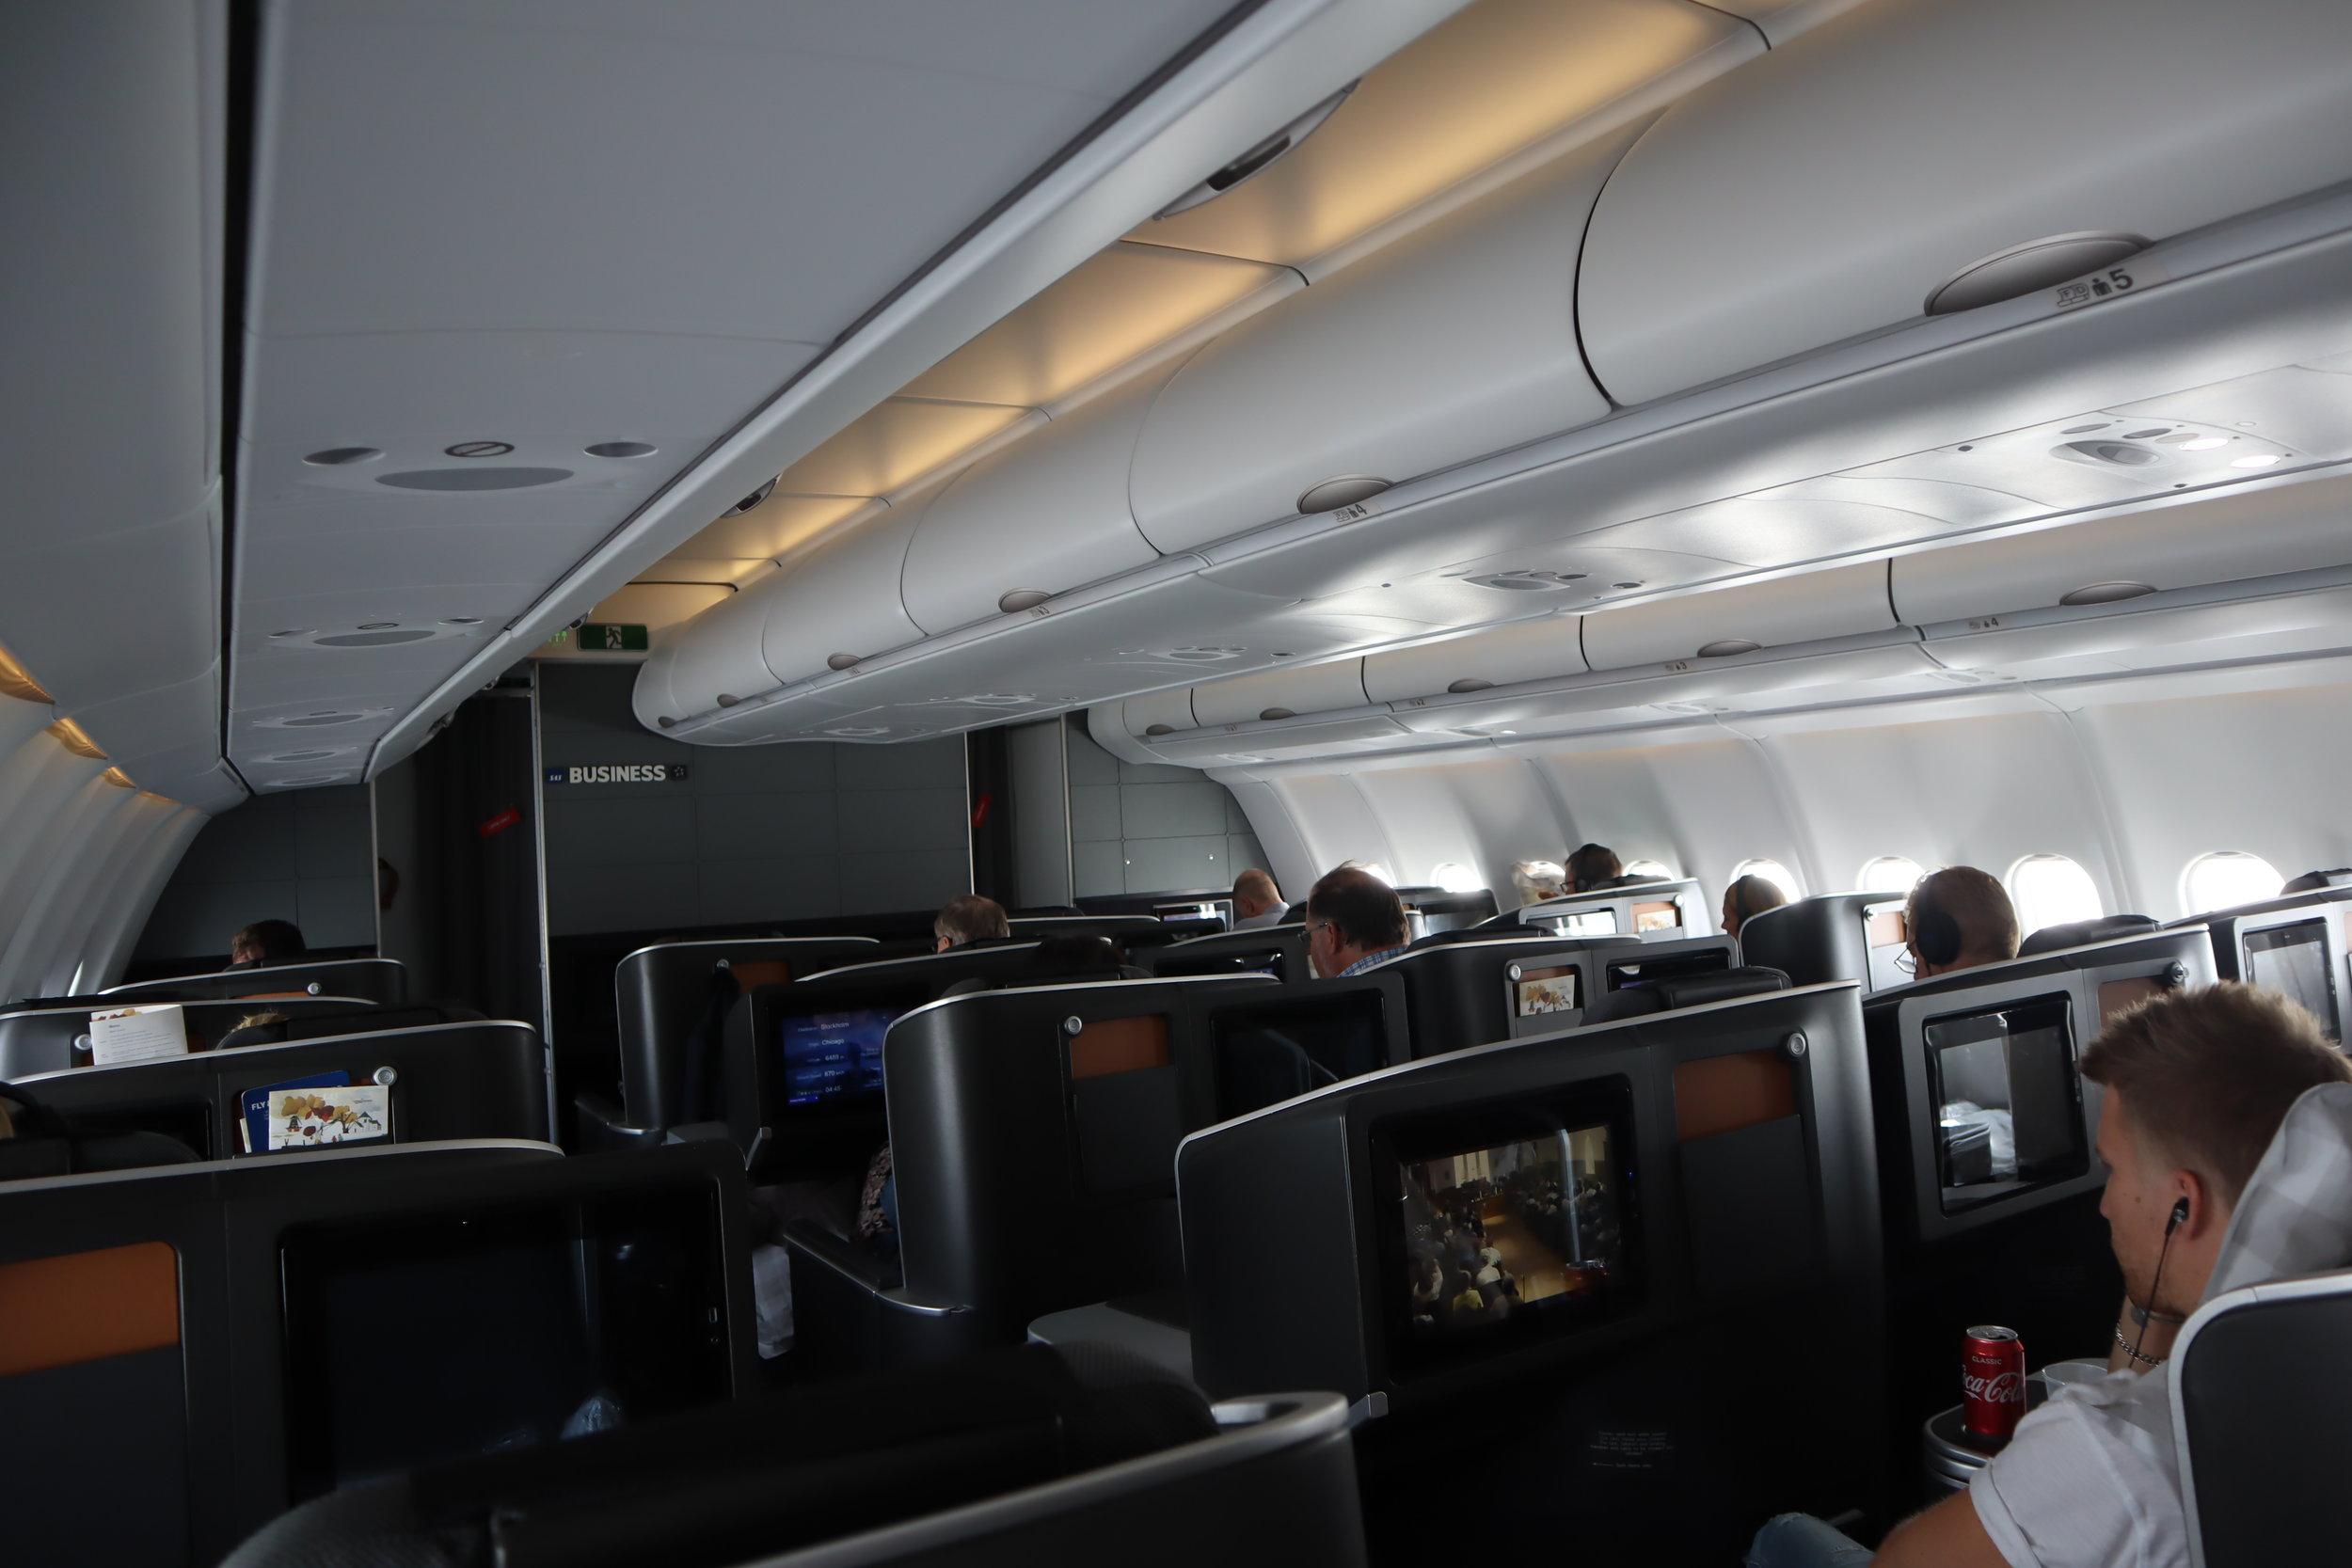 SAS business class – Cabin